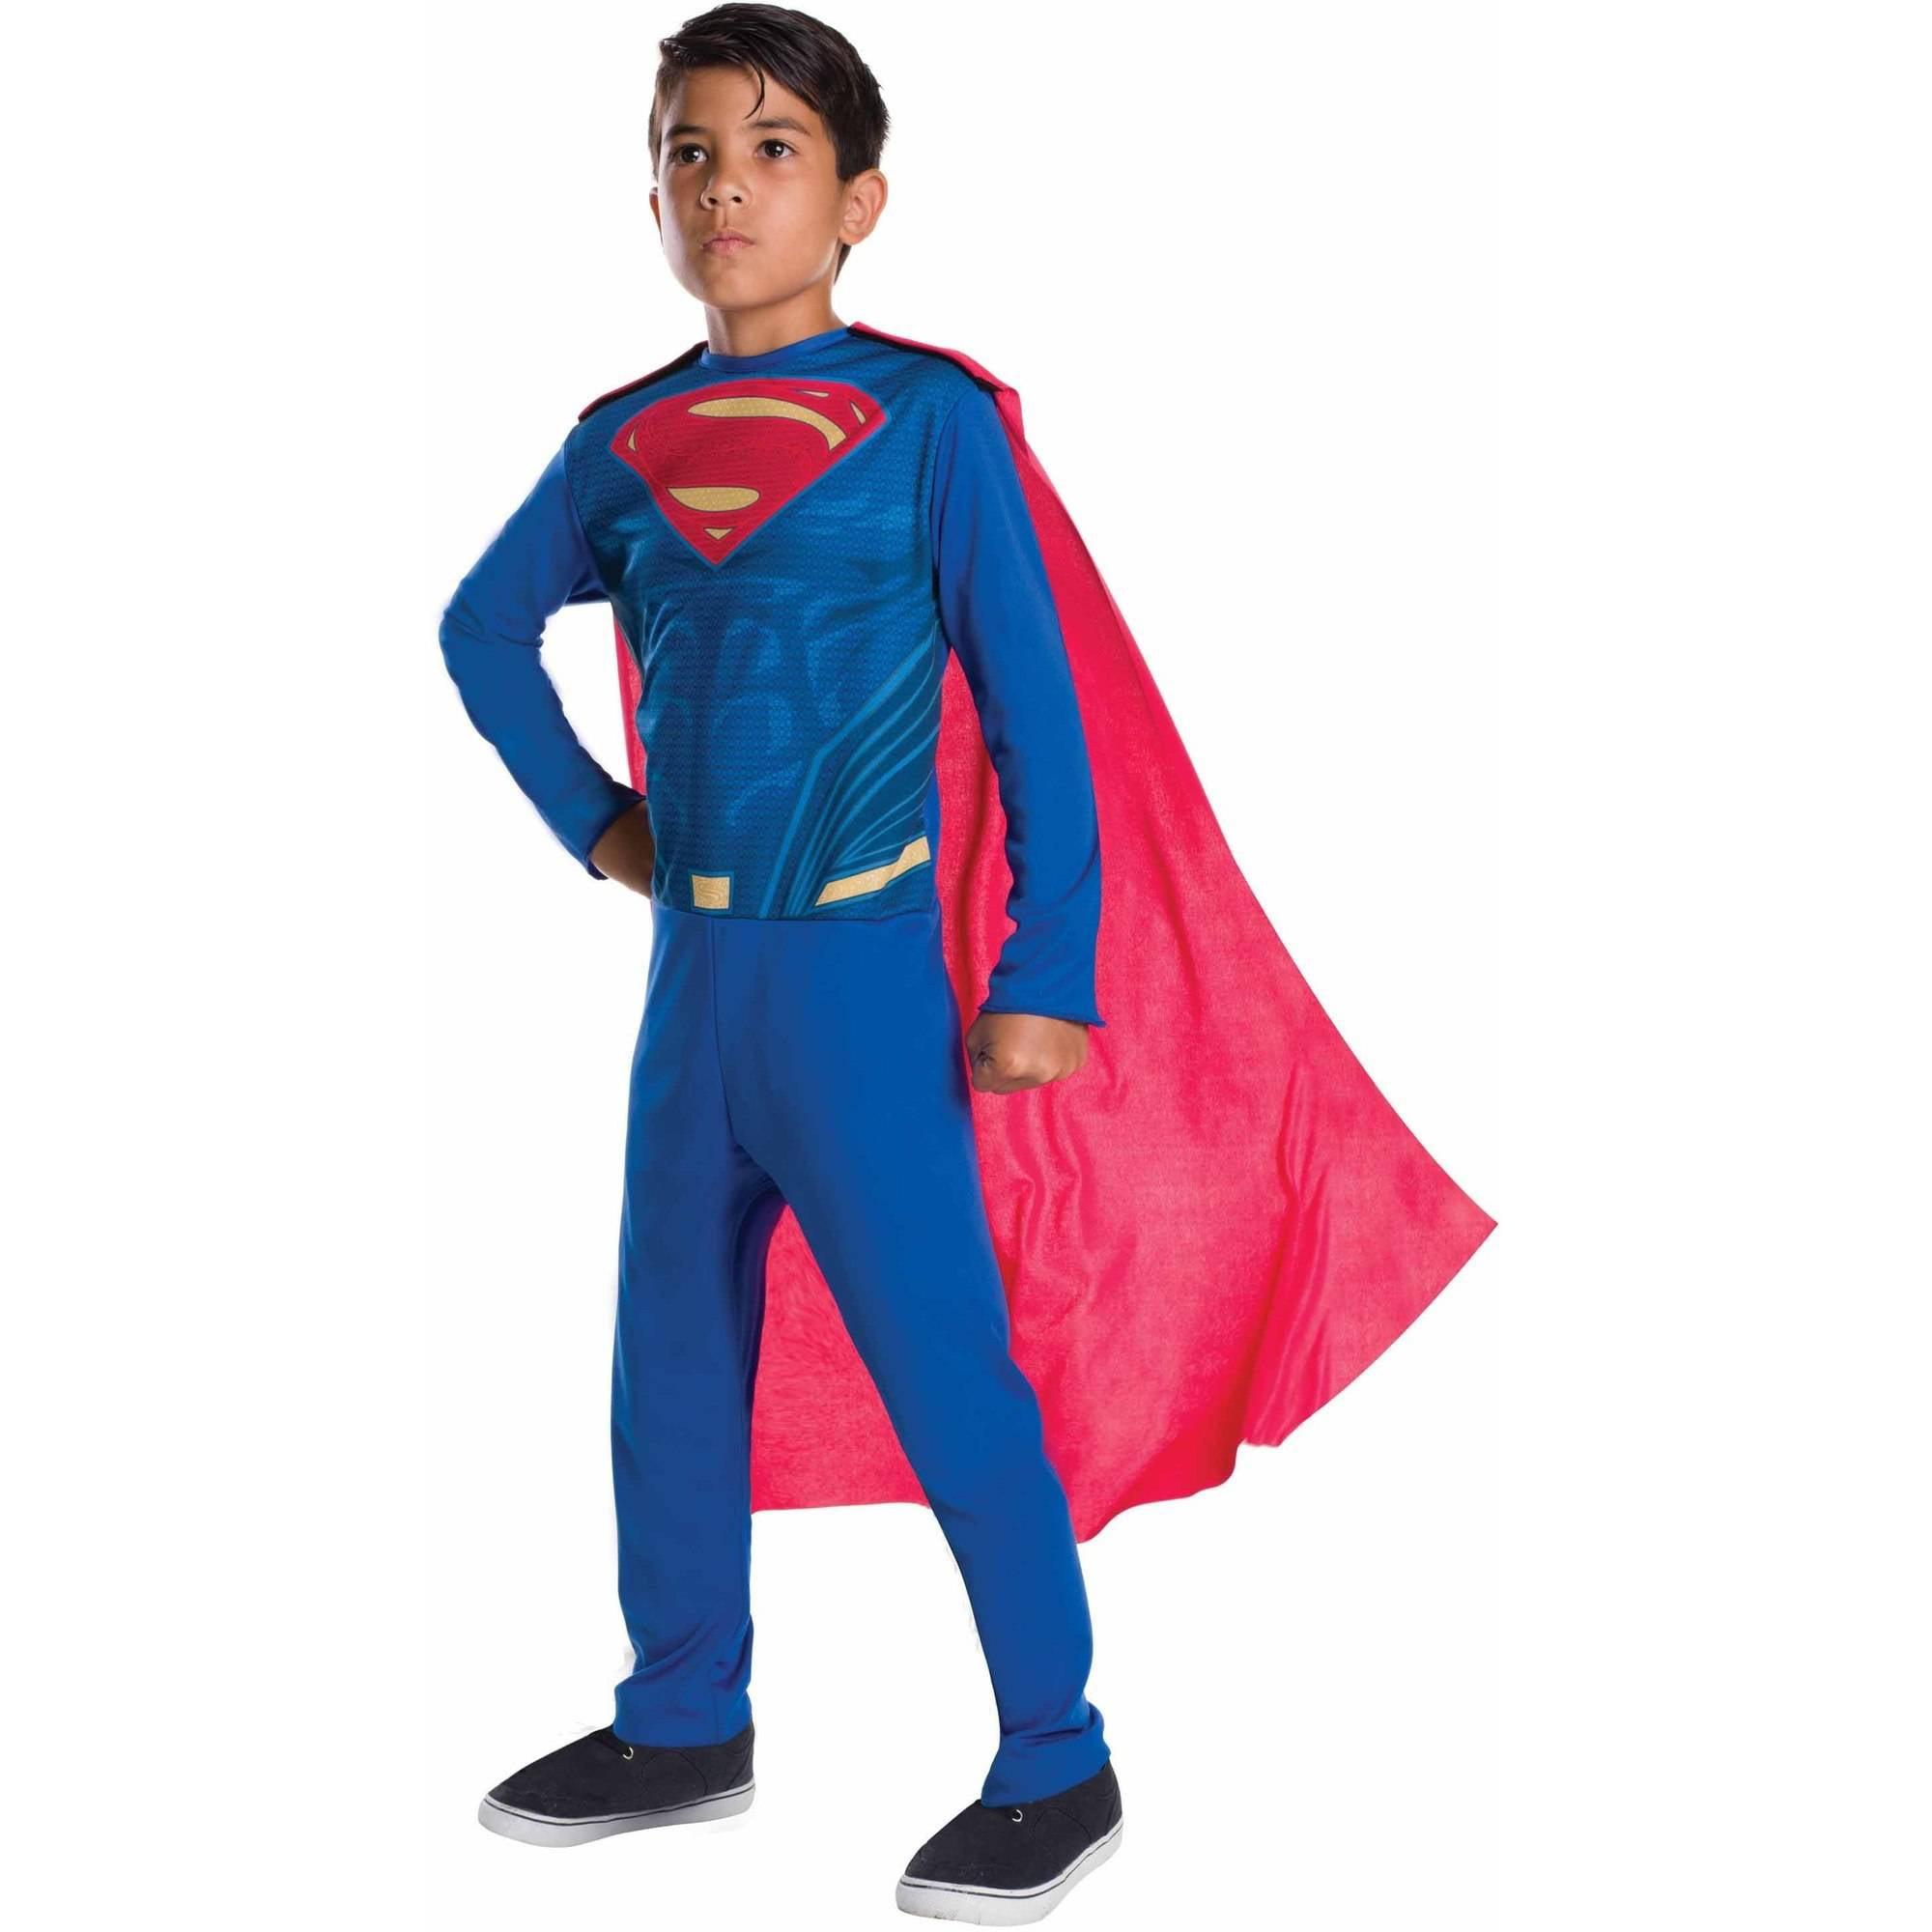 Justice League Superman Child's Costume, Large (10-12)